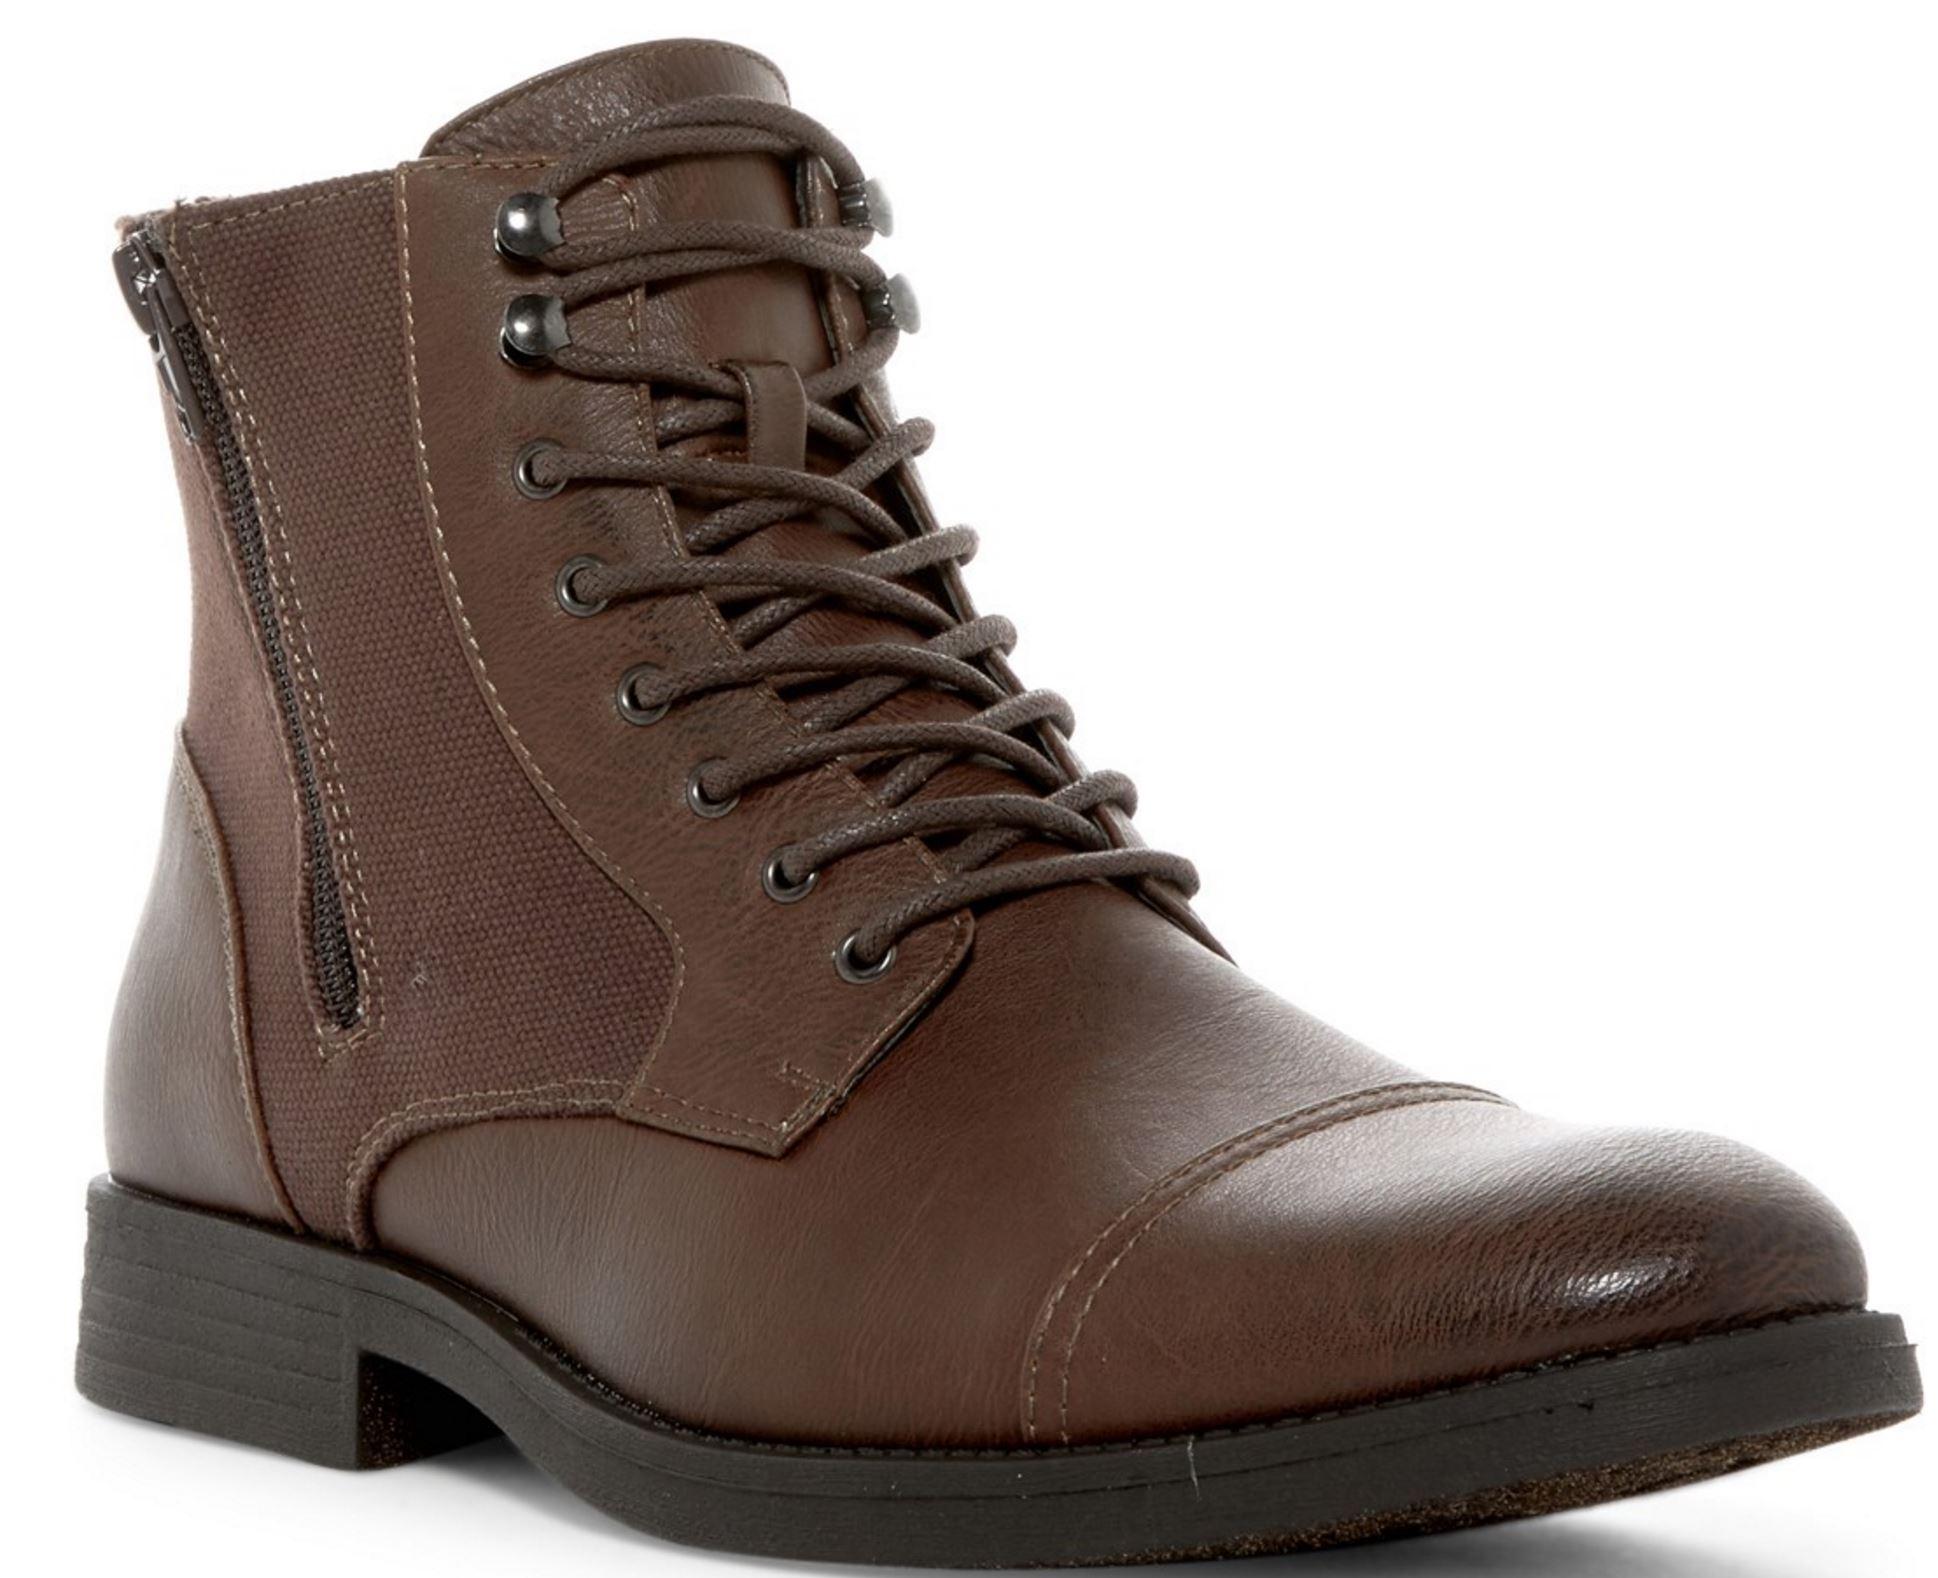 96709a2b911 Mens Boots: Wolverine Julian Suede Chukka $37, Robert Wayne Efny Cap ...